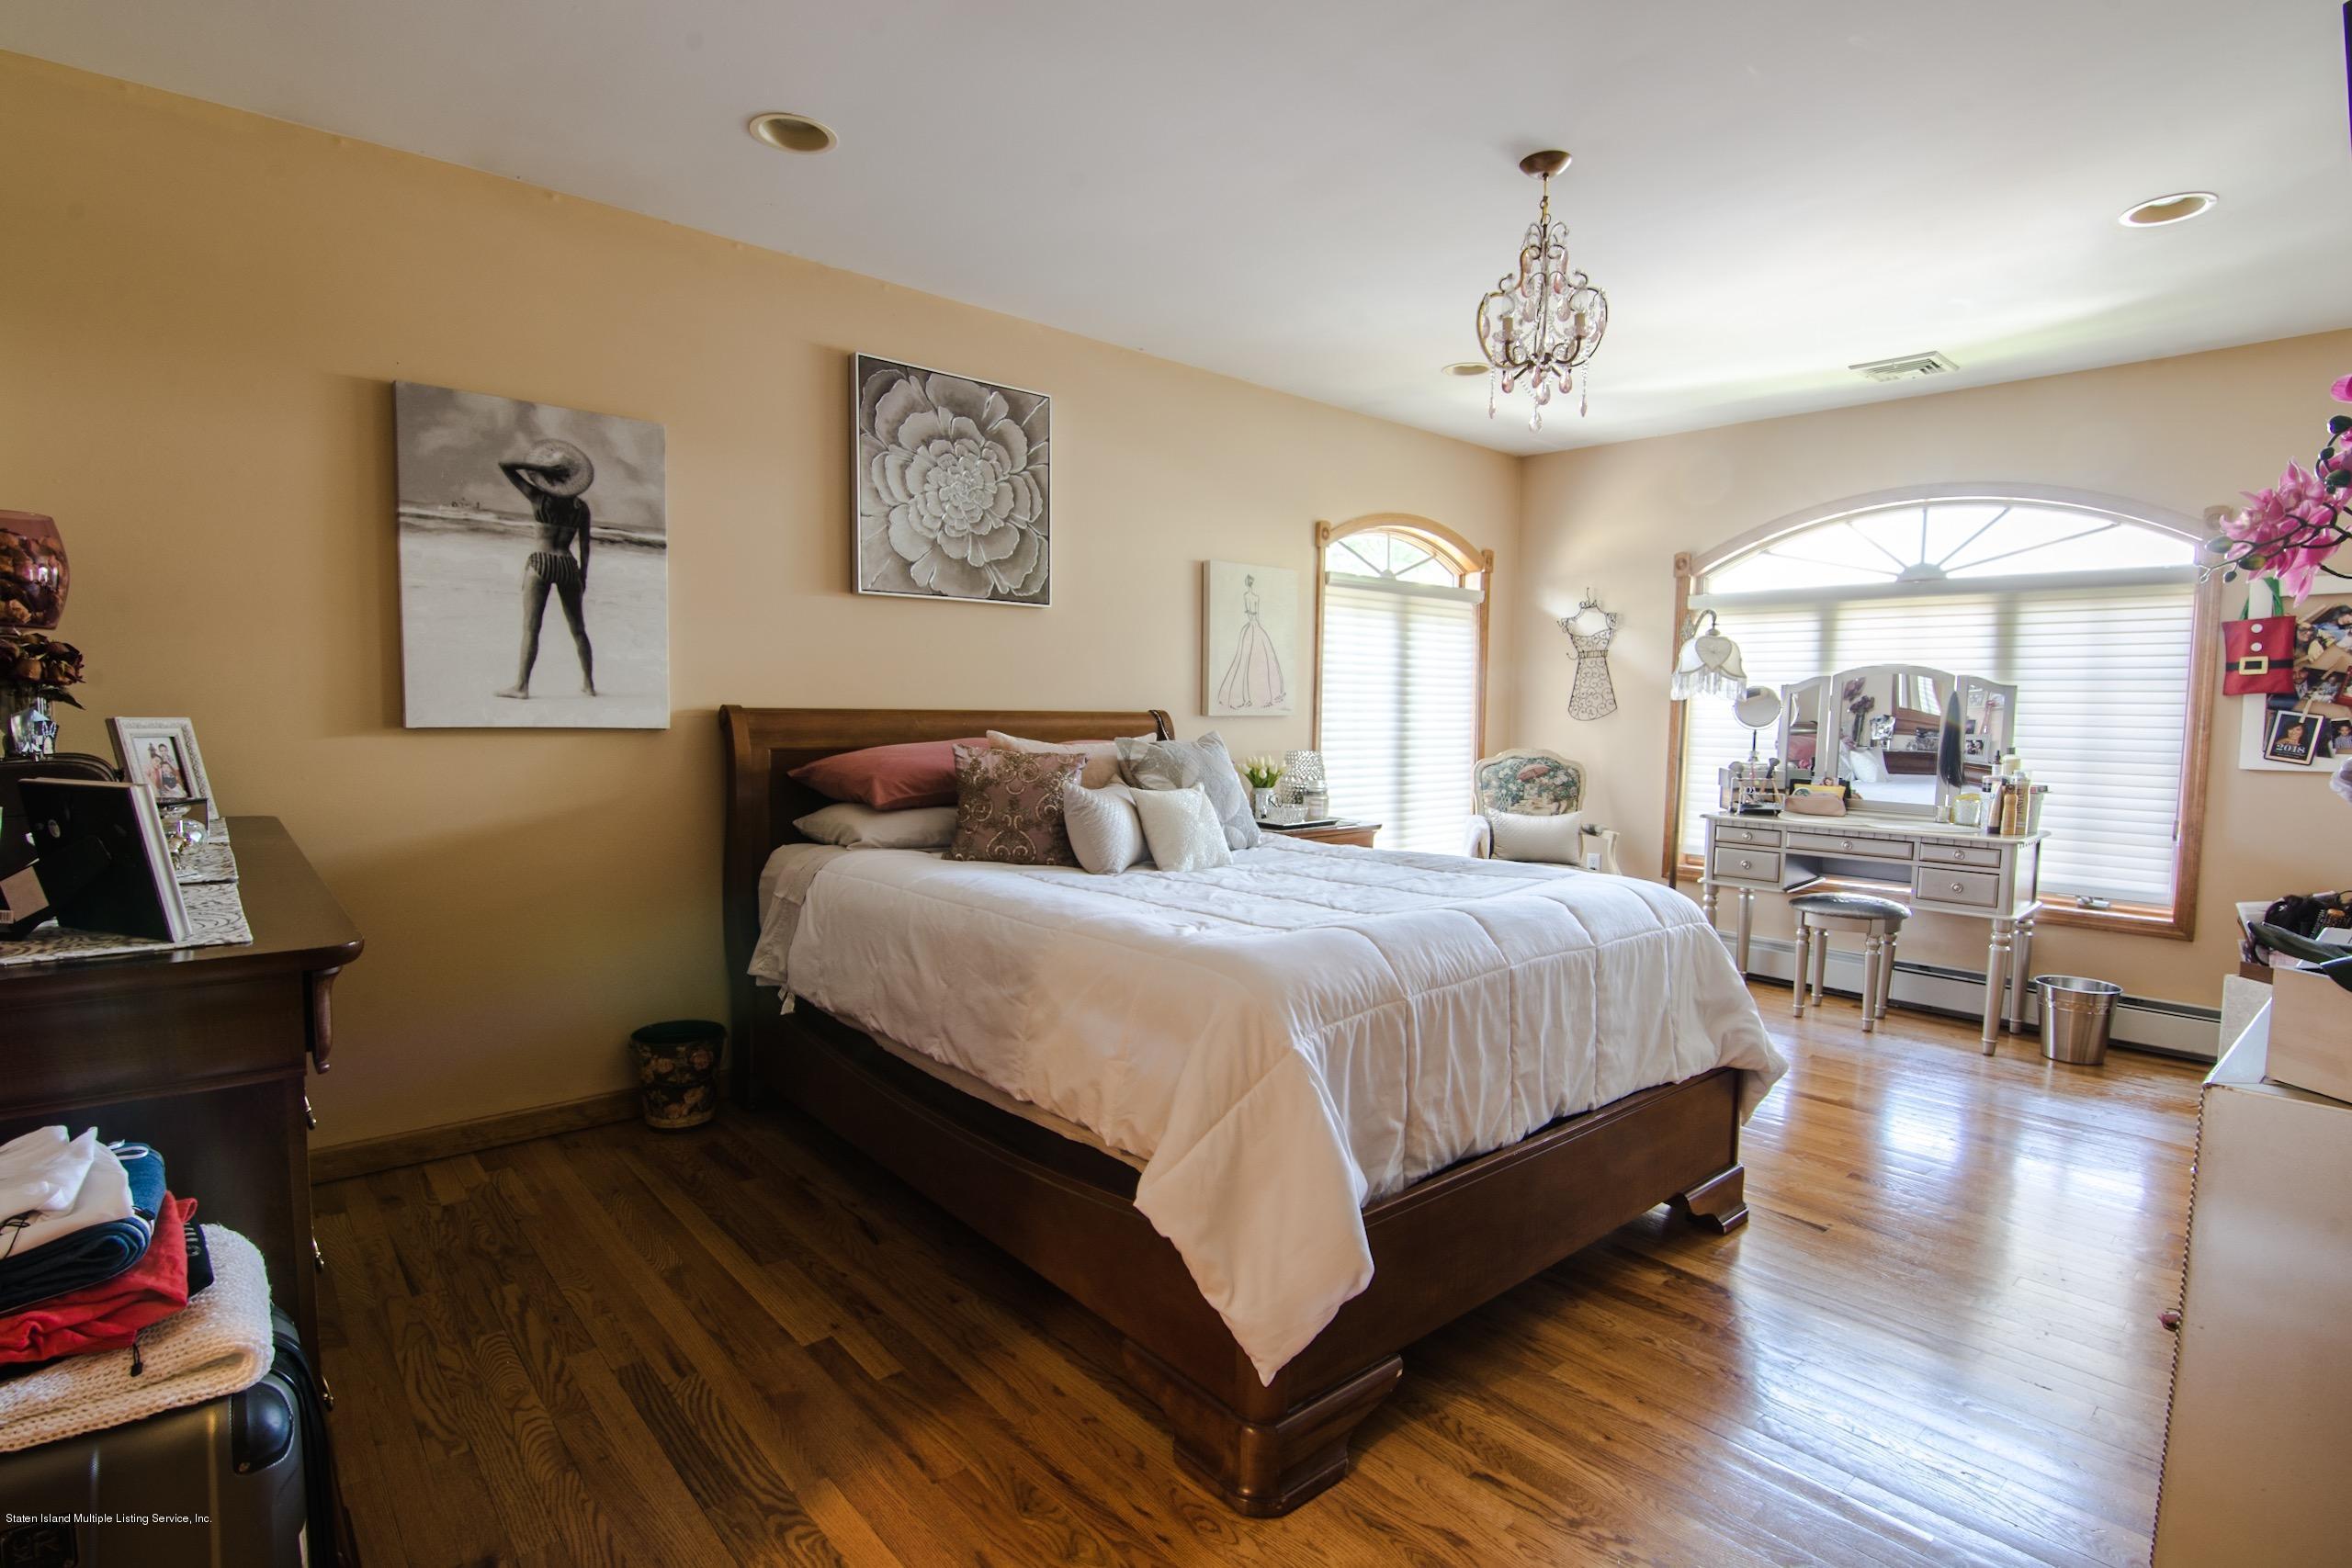 Single Family - Detached 120 Milden Avenue  Staten Island, NY 10301, MLS-1121068-12